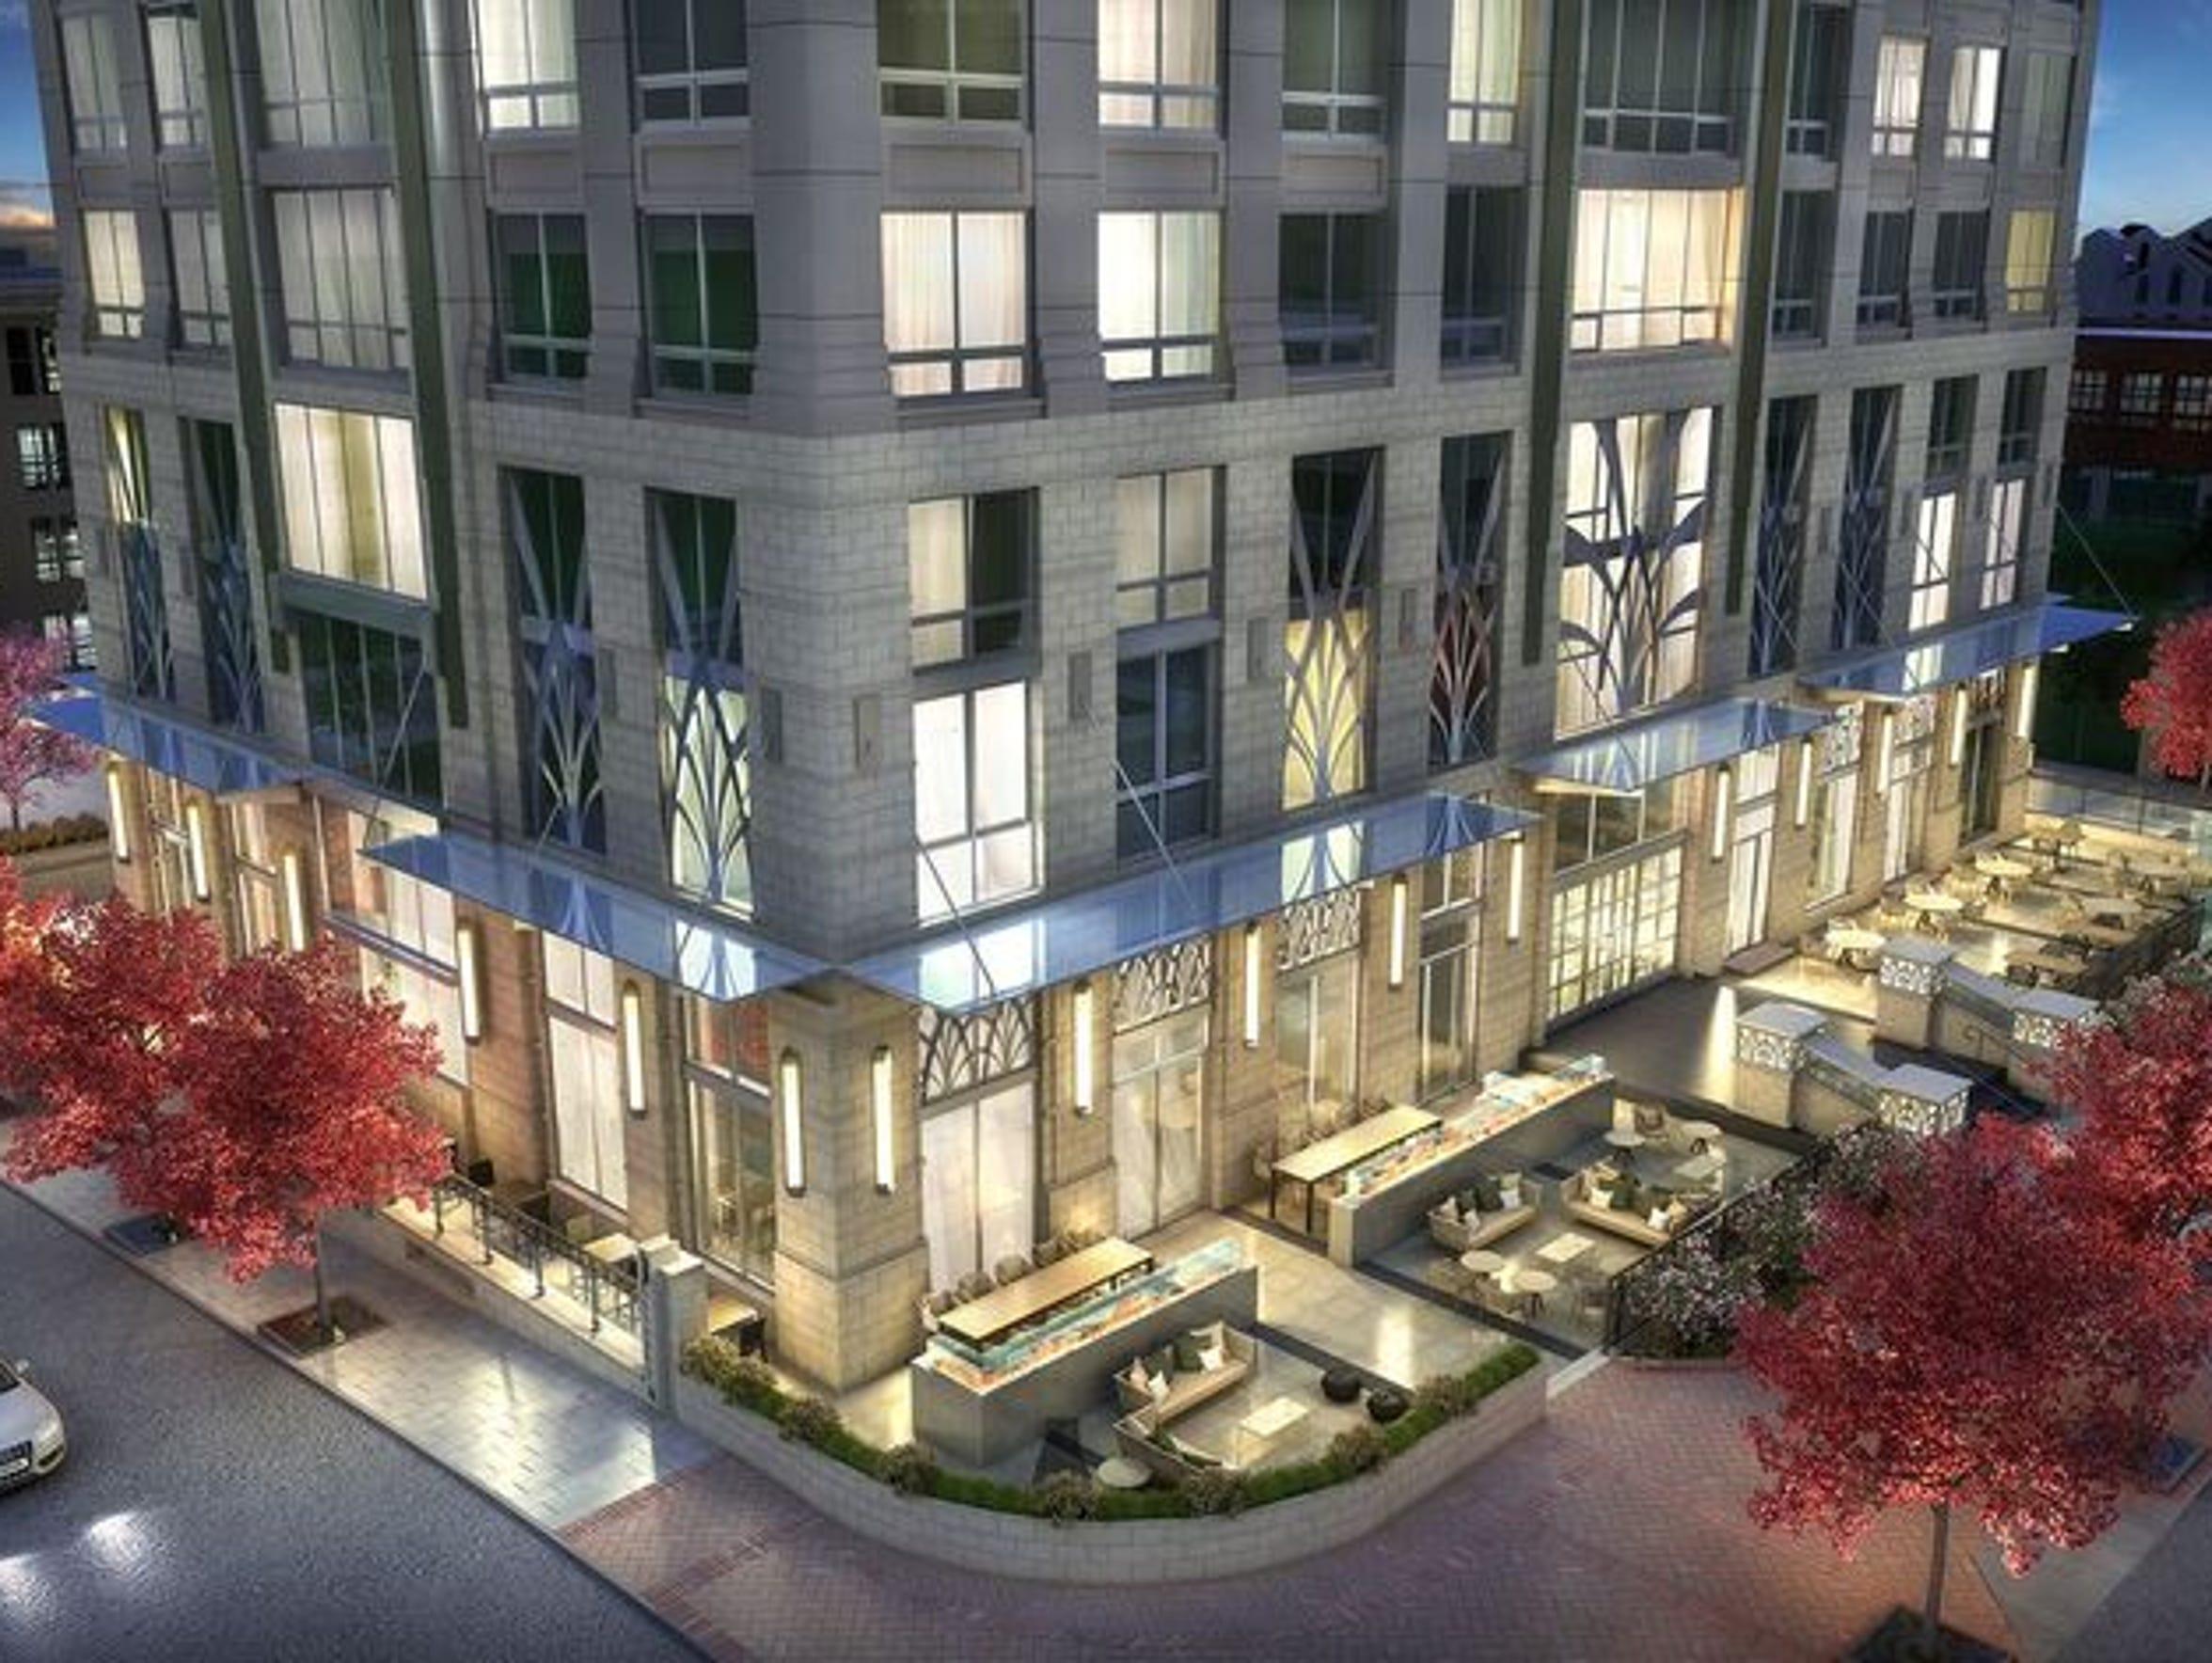 The Arras hotel/condominium building will create a